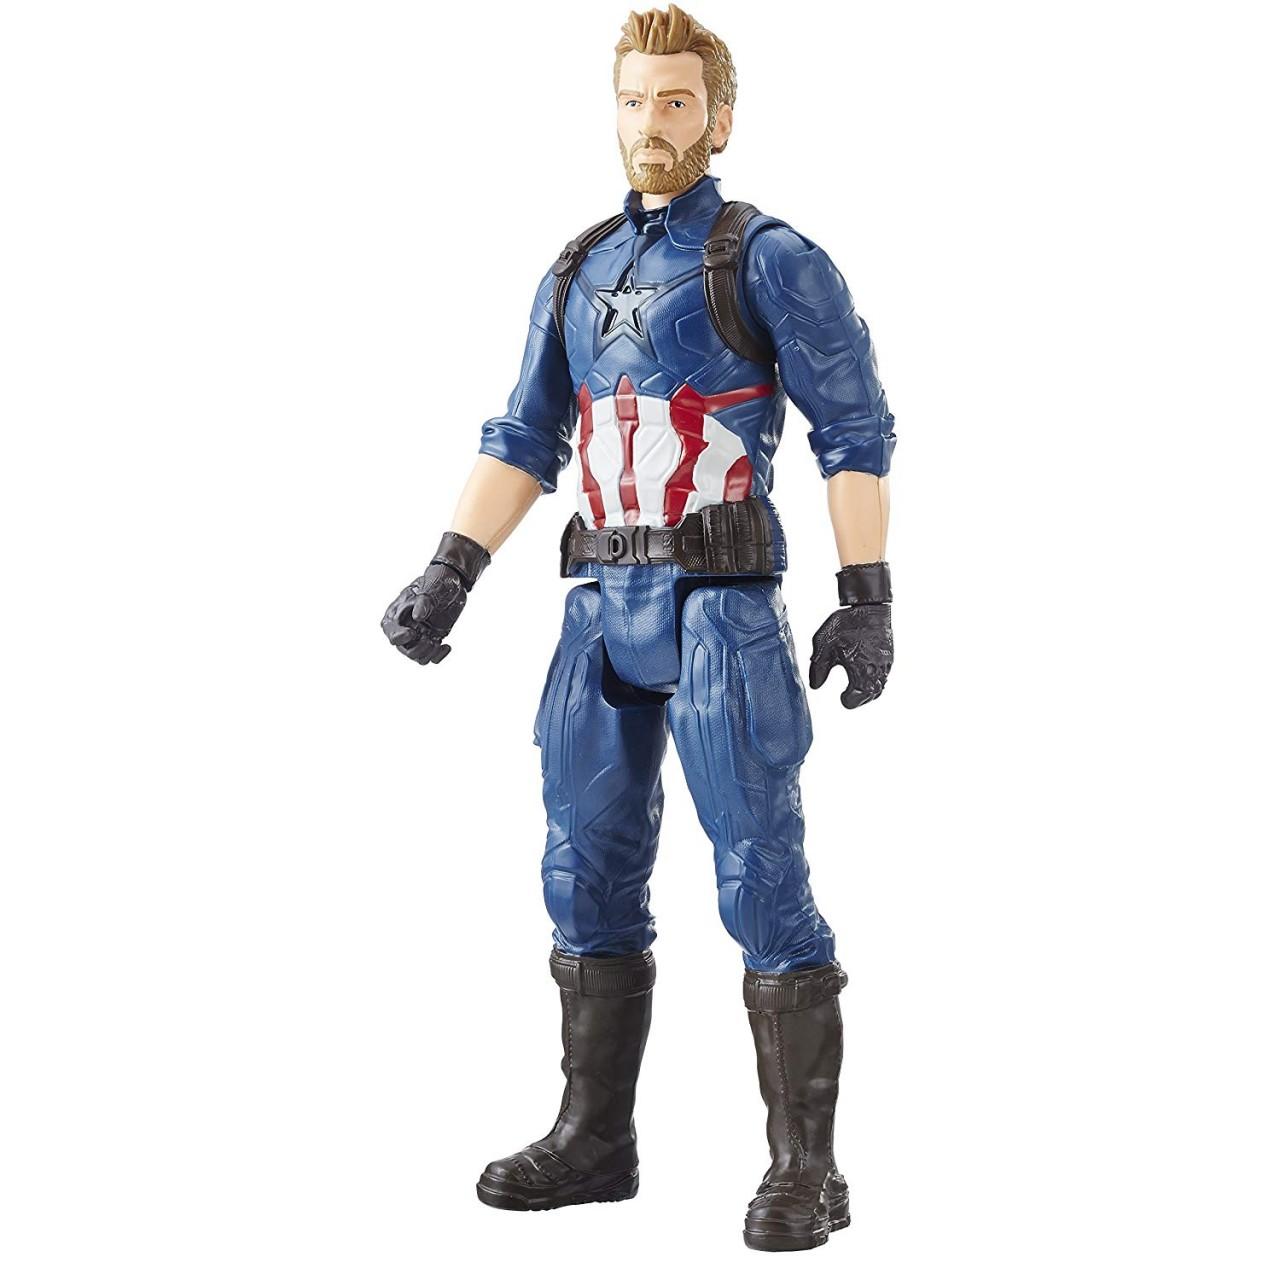 "Фигурка Капитан Америка E1421 ""Мстители: Война бесконечности"" серия Titan Hero Power FX Port"